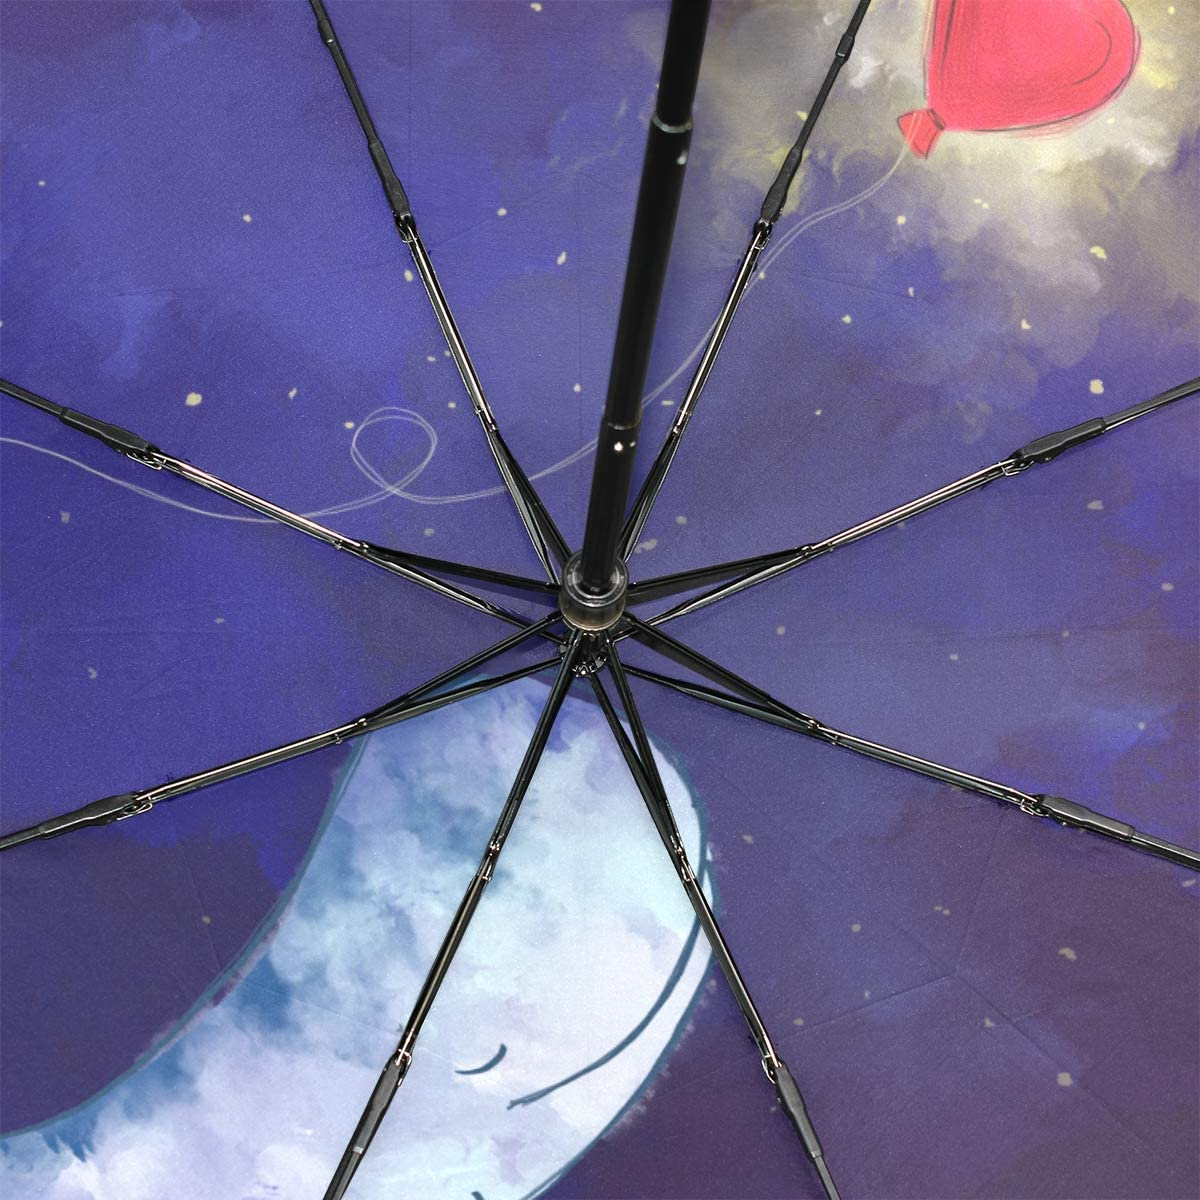 Big Kids Umbrella Cute Whale Hold Girl Heart Balloon Over Starry Night Portable Compact Folding Umbrella Anti Uv Protection Windproof Outdoor Travel Women Inverted Umbrella Black